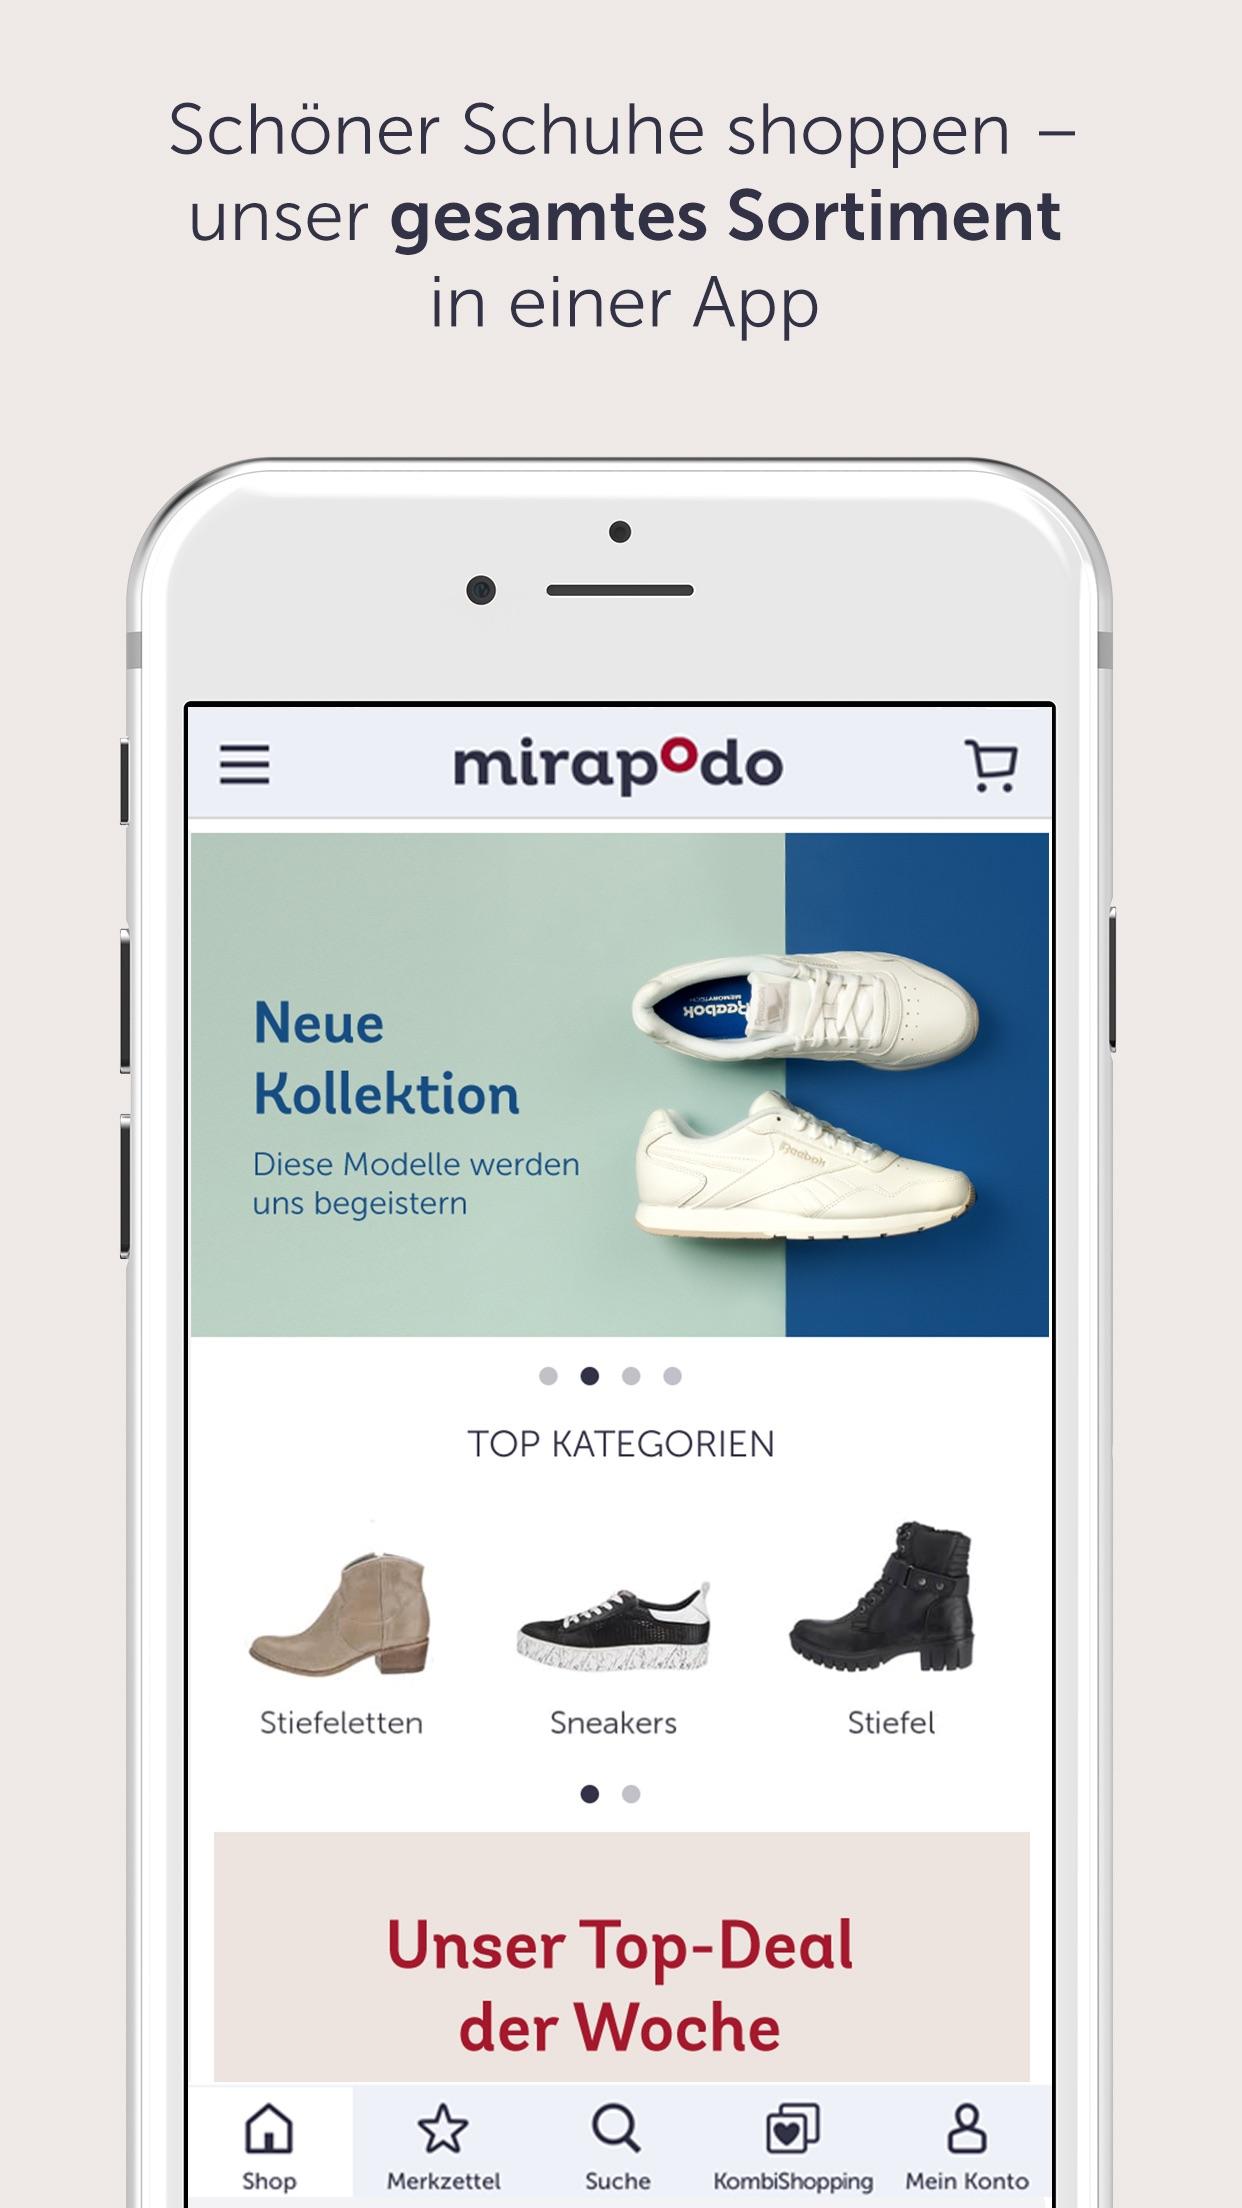 mirapodo Schuhe, Sneaker & Stiefel Shop by myToys GmbH